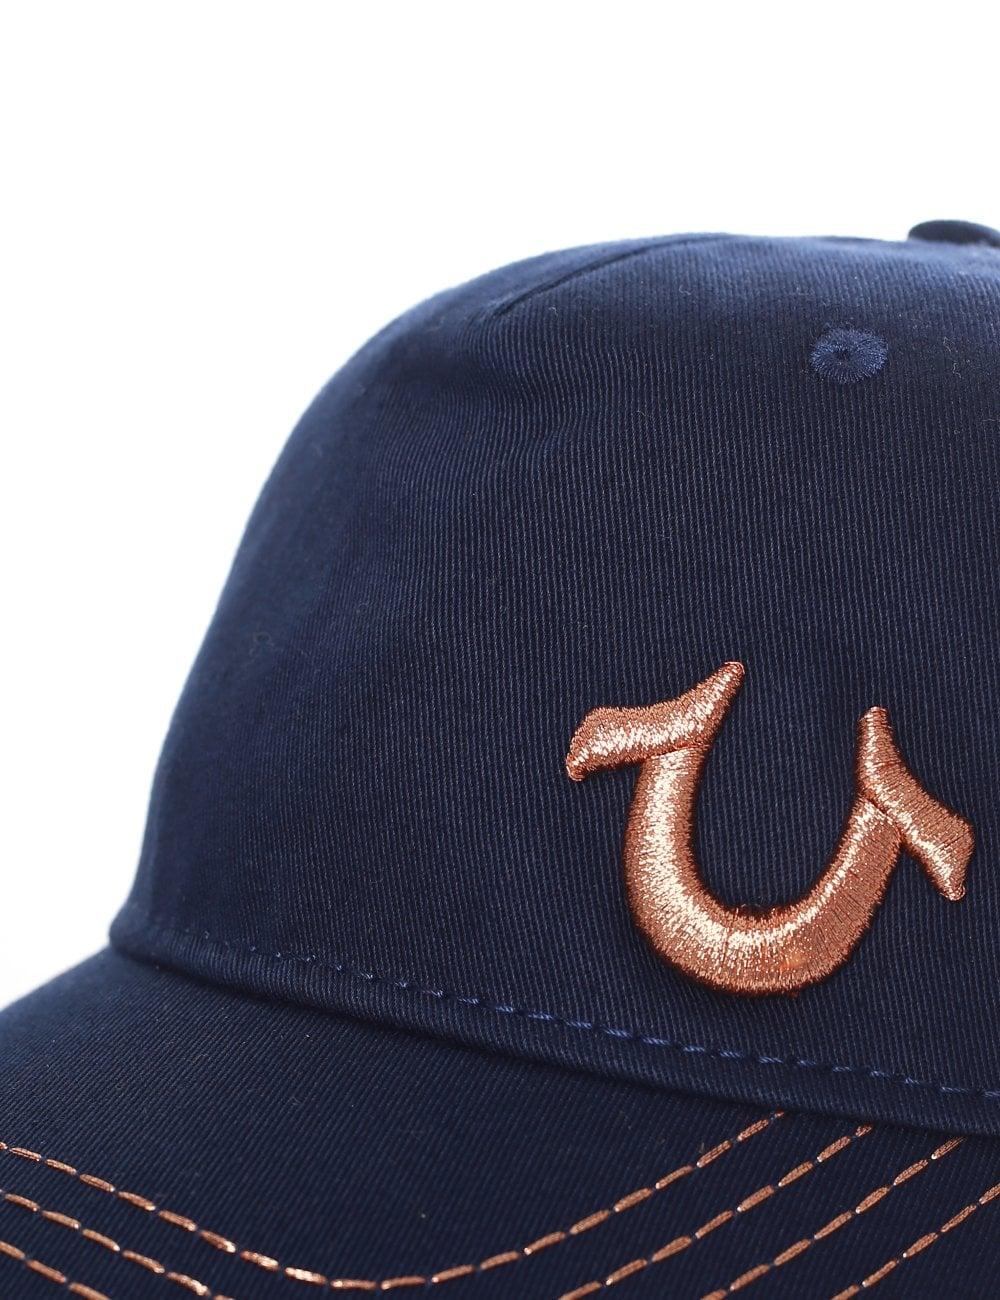 7e0ac62d5 True Religion Men's 3D Embroidered Horseshoe Cap